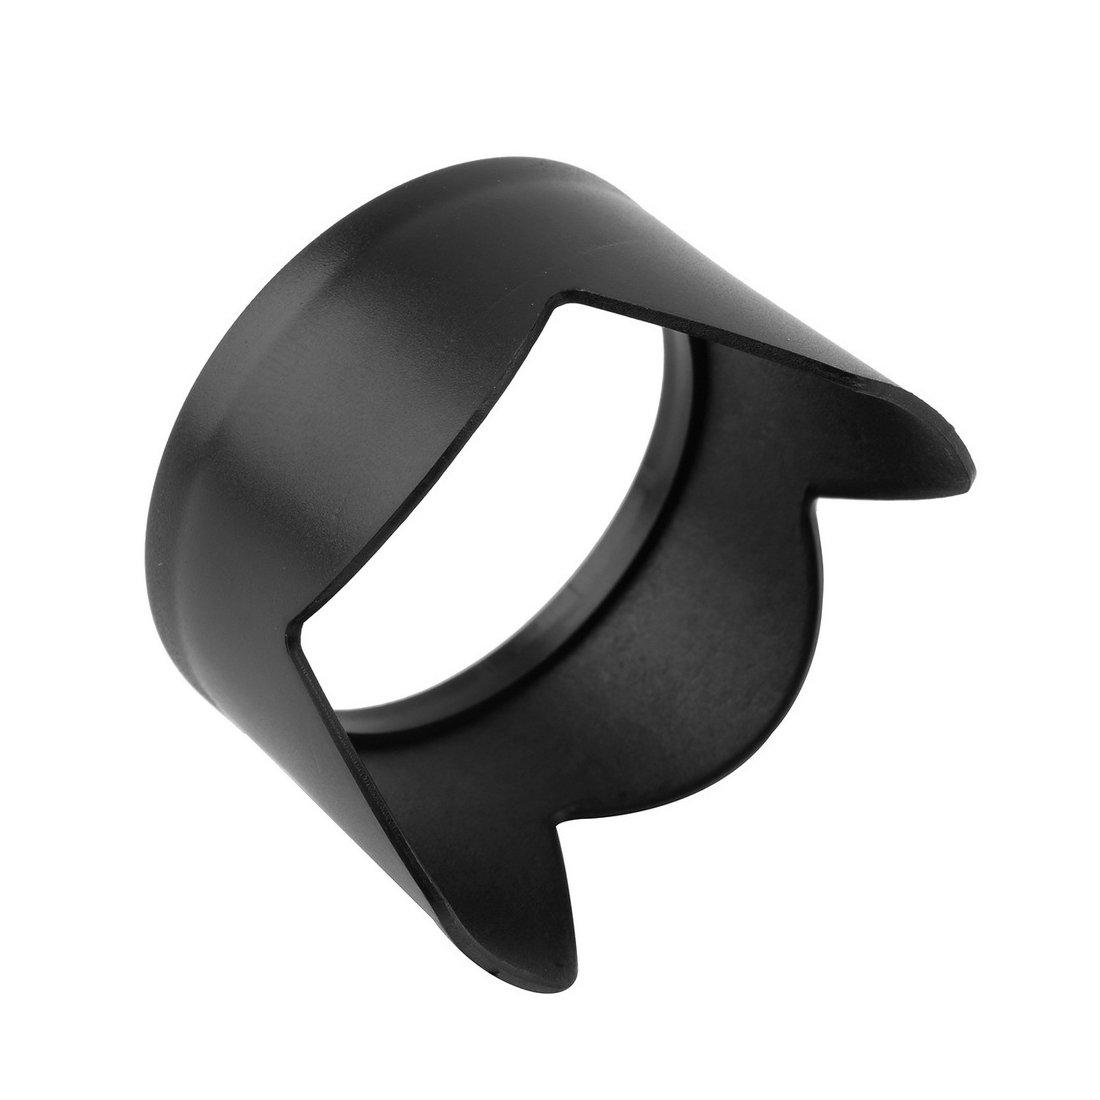 LILIERS High Anti-Glare Petal Shaped Sun Shade Lens Hood Protective Cover for DJI Phantom 3